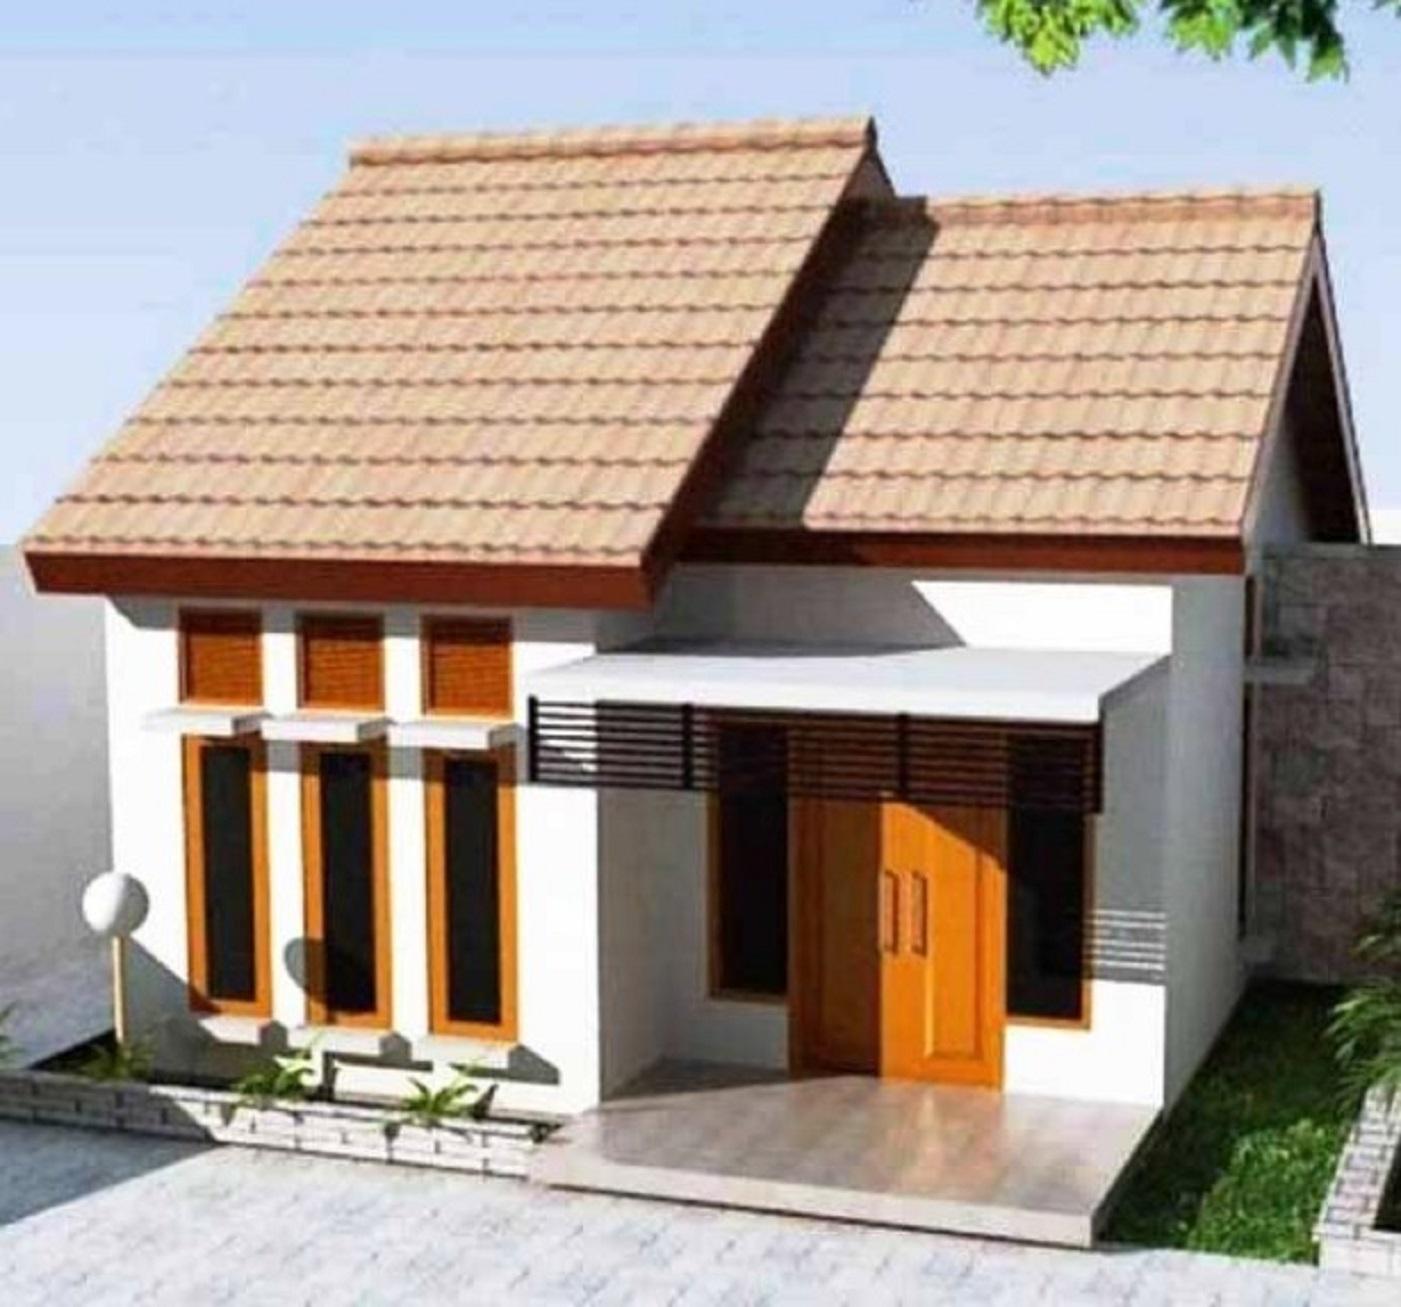 Rumah Minimalis Sederhana Kecil